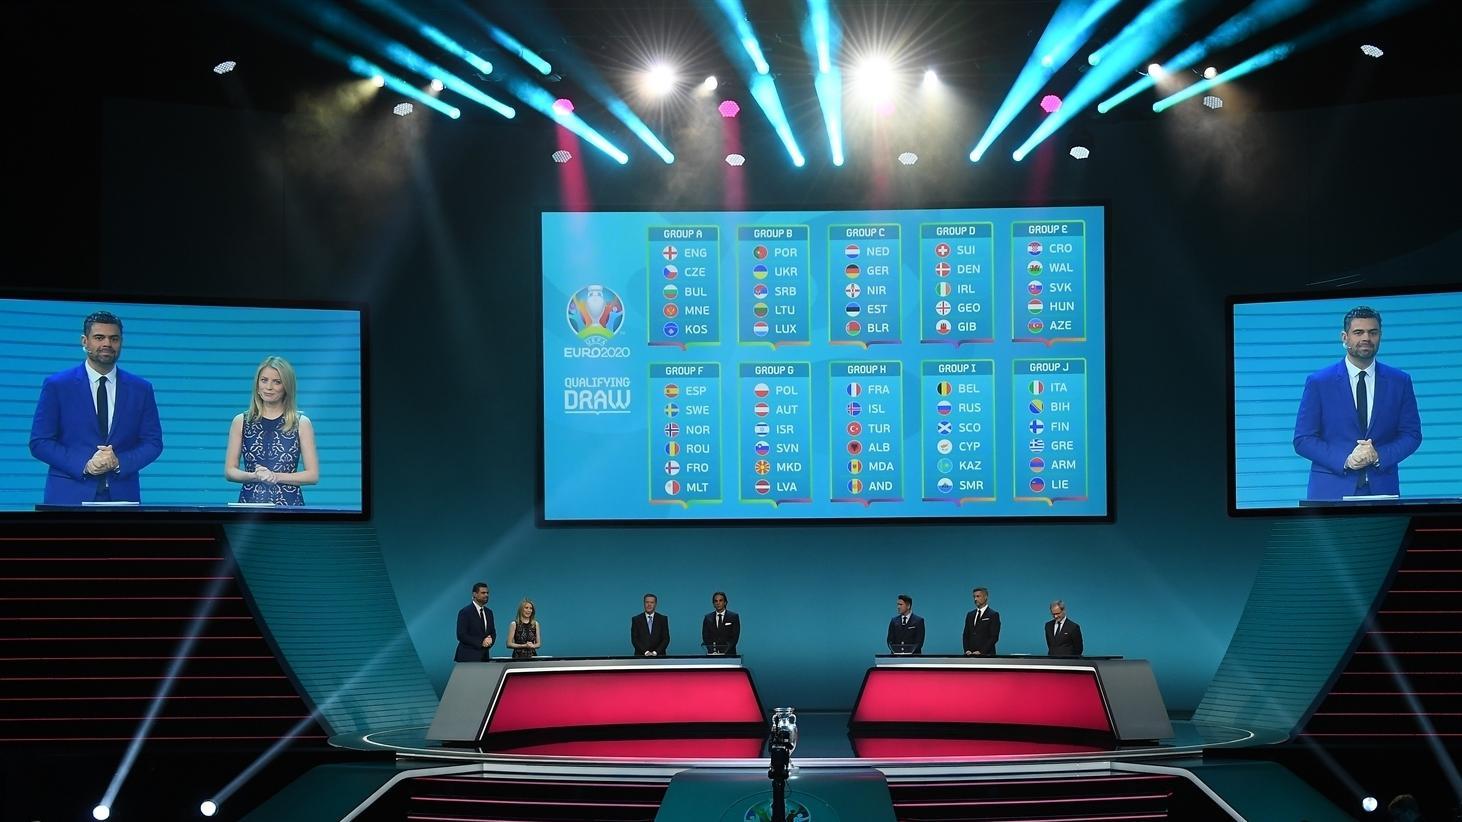 Le Calendrier Euro 2020.Eliminatoires Uefa Euro 2020 Les Groupes Eliminatoires